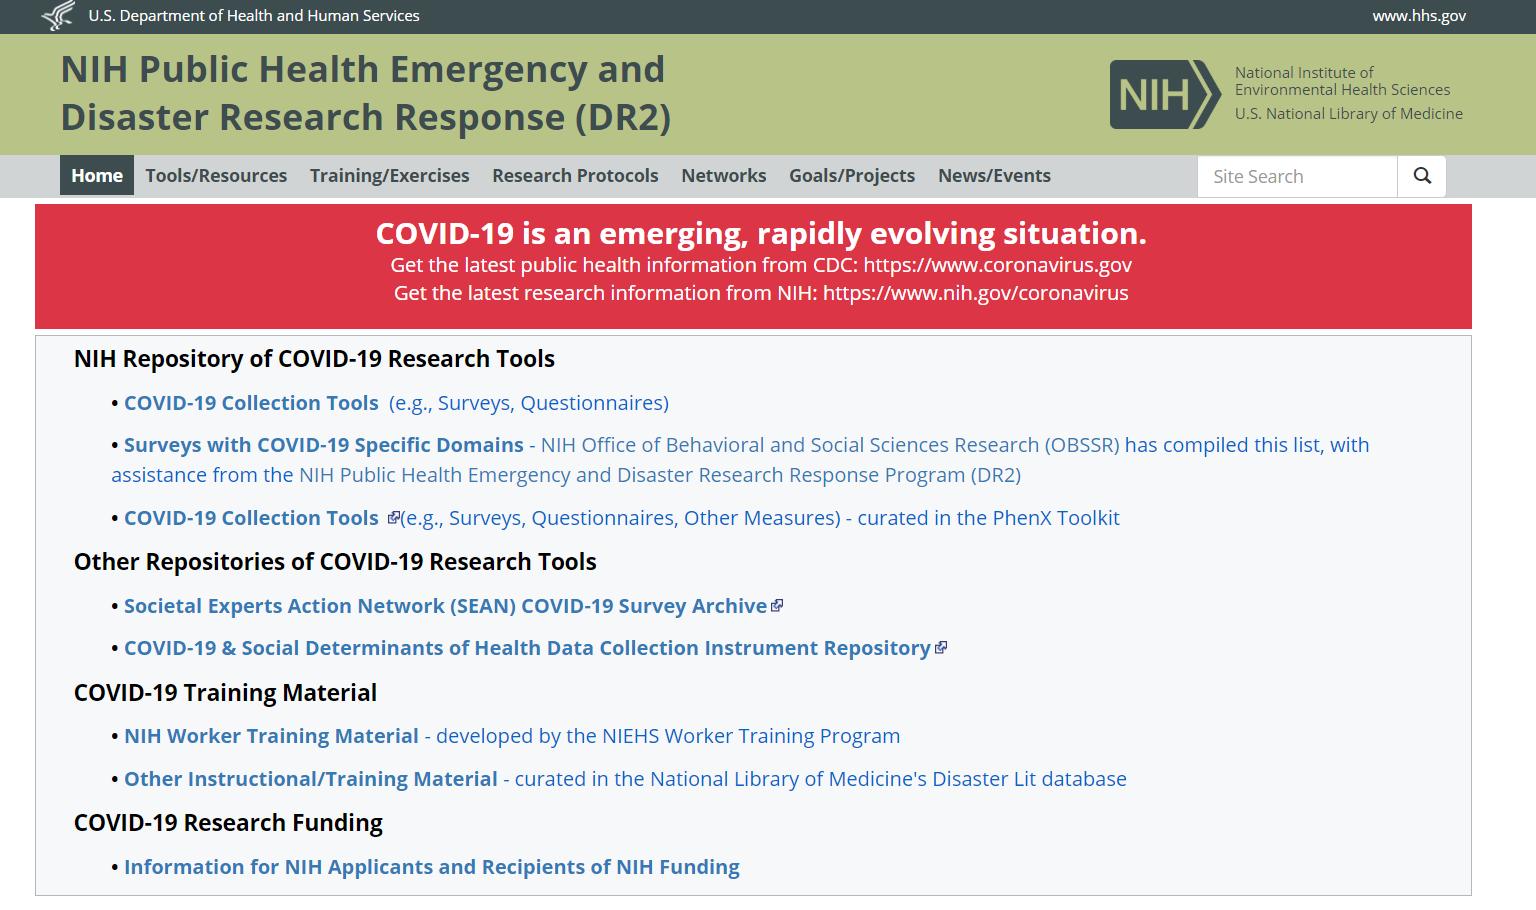 screenshot of NIH Disaster Research Response Homepage